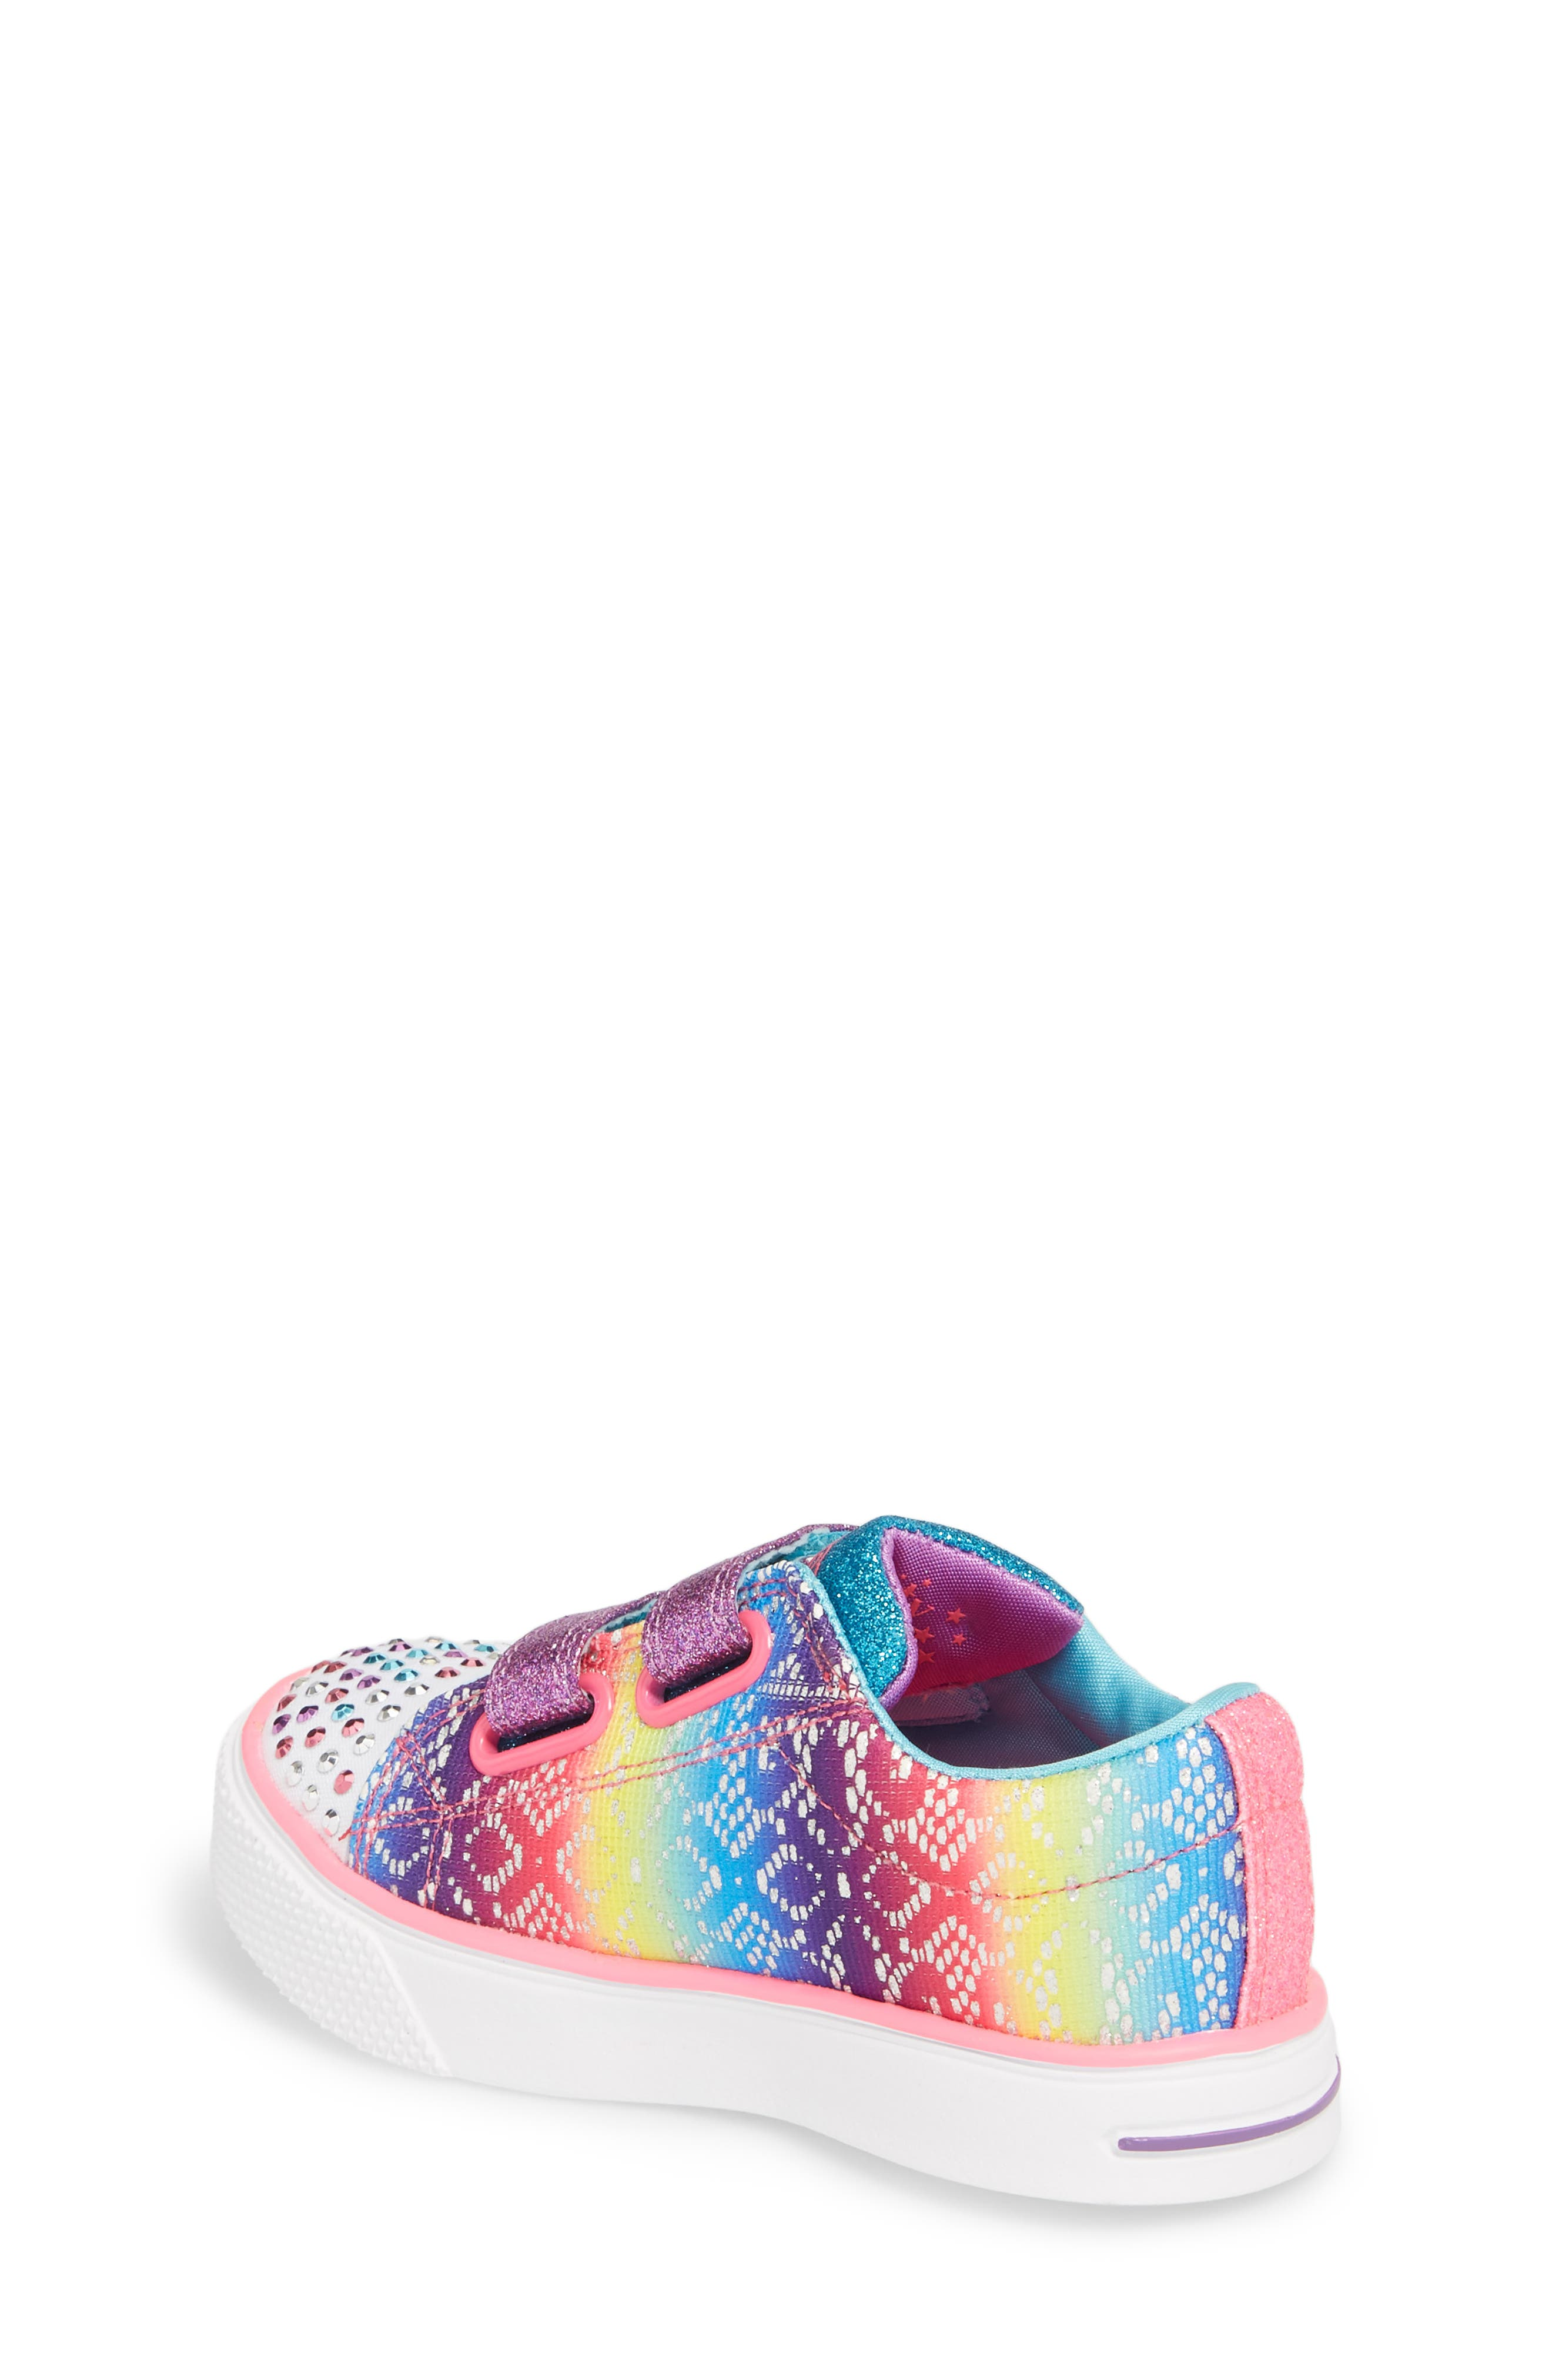 Twinkle Toes Breeze 2.0 Light-Up Sneaker,                             Alternate thumbnail 2, color,                             Multi